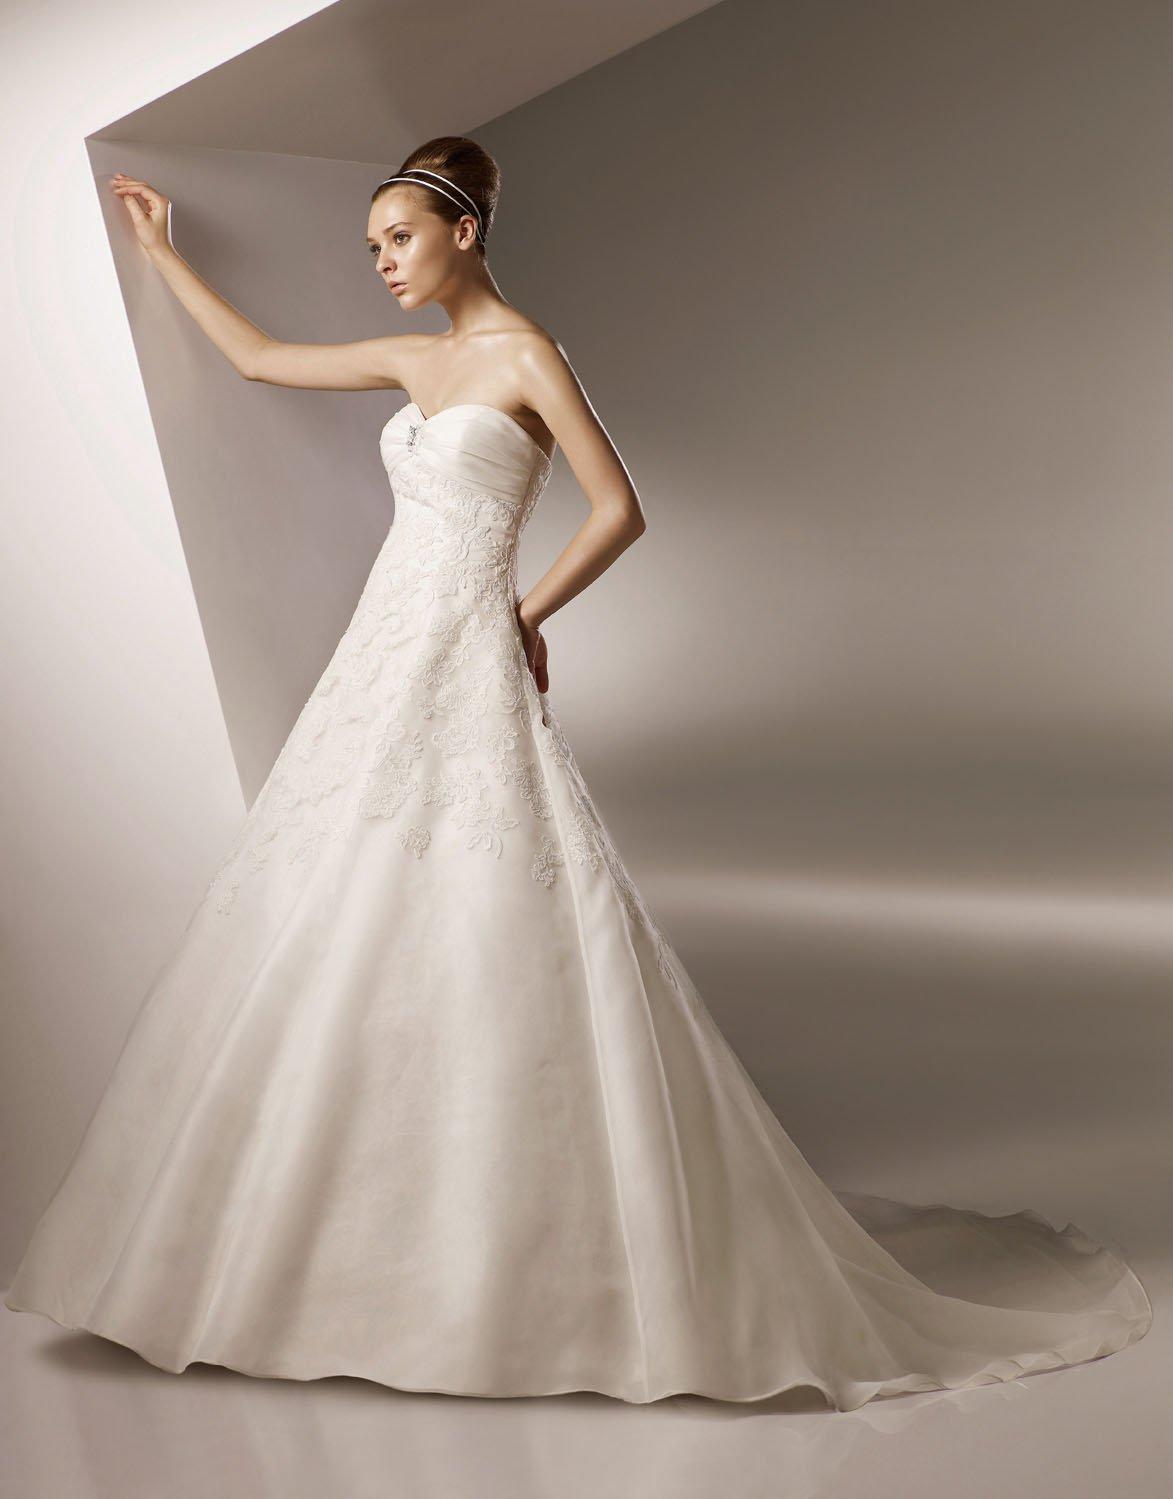 Sweetheart Appliqued Organza Wedding Dress Bridal Gown